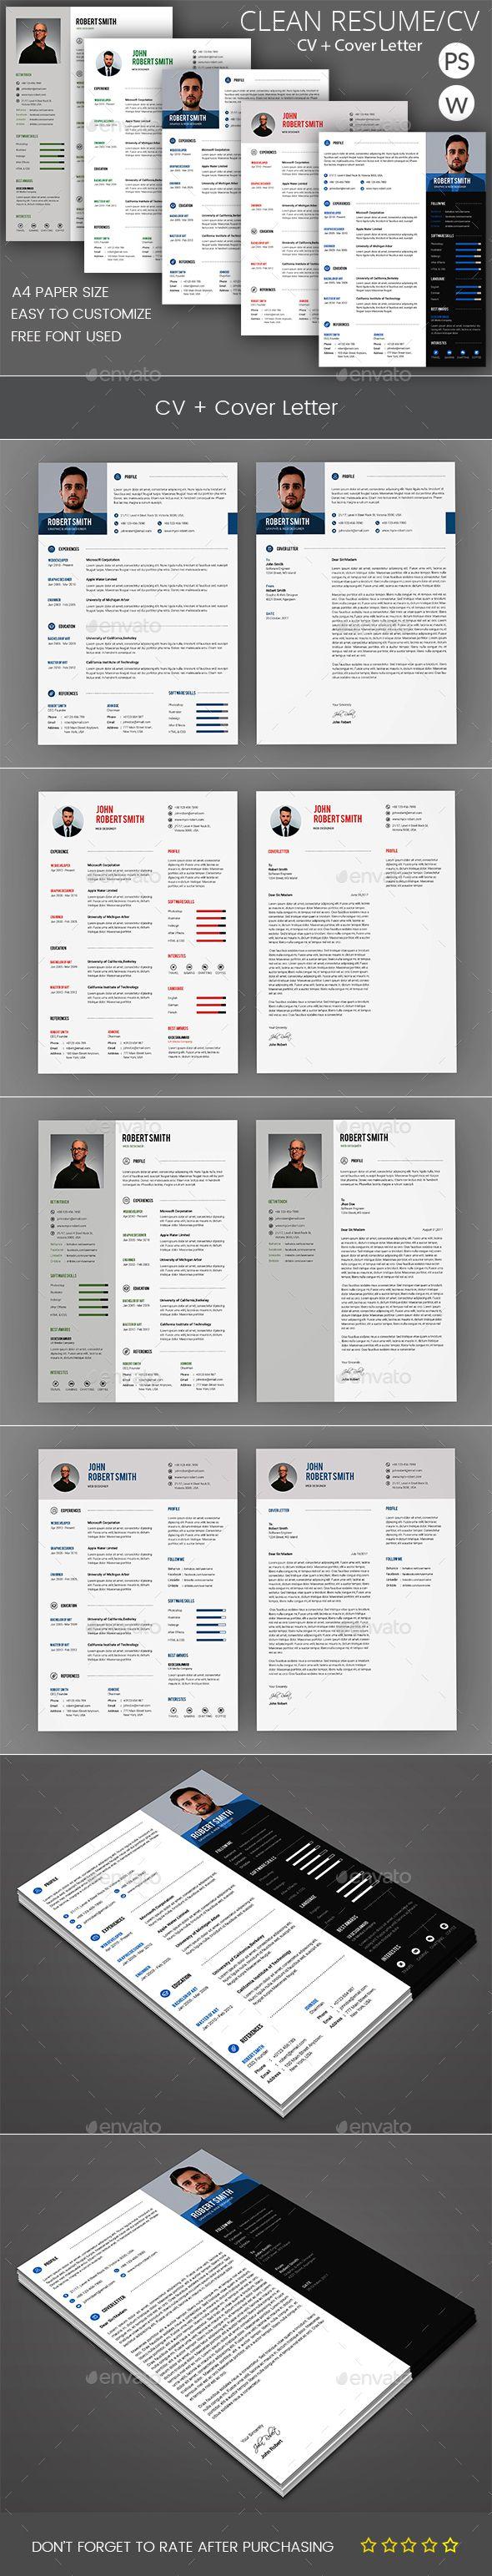 15 best Stylist Resume images on Pinterest | Cv template, Resume ...